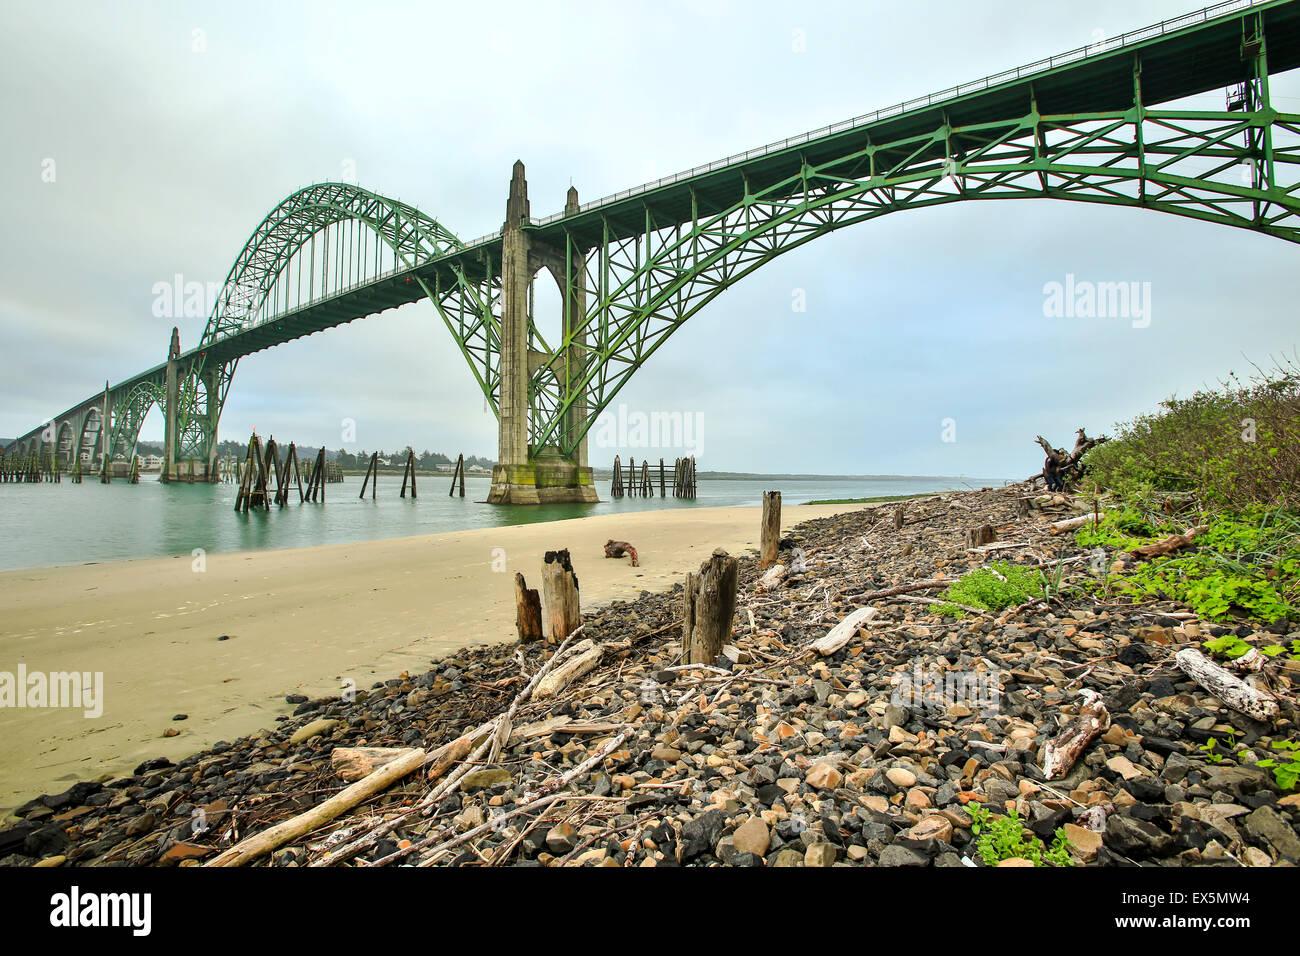 Wooden pylons, gravel and Yaquina Bay Bridge, Newport, Oregon USA - Stock Image